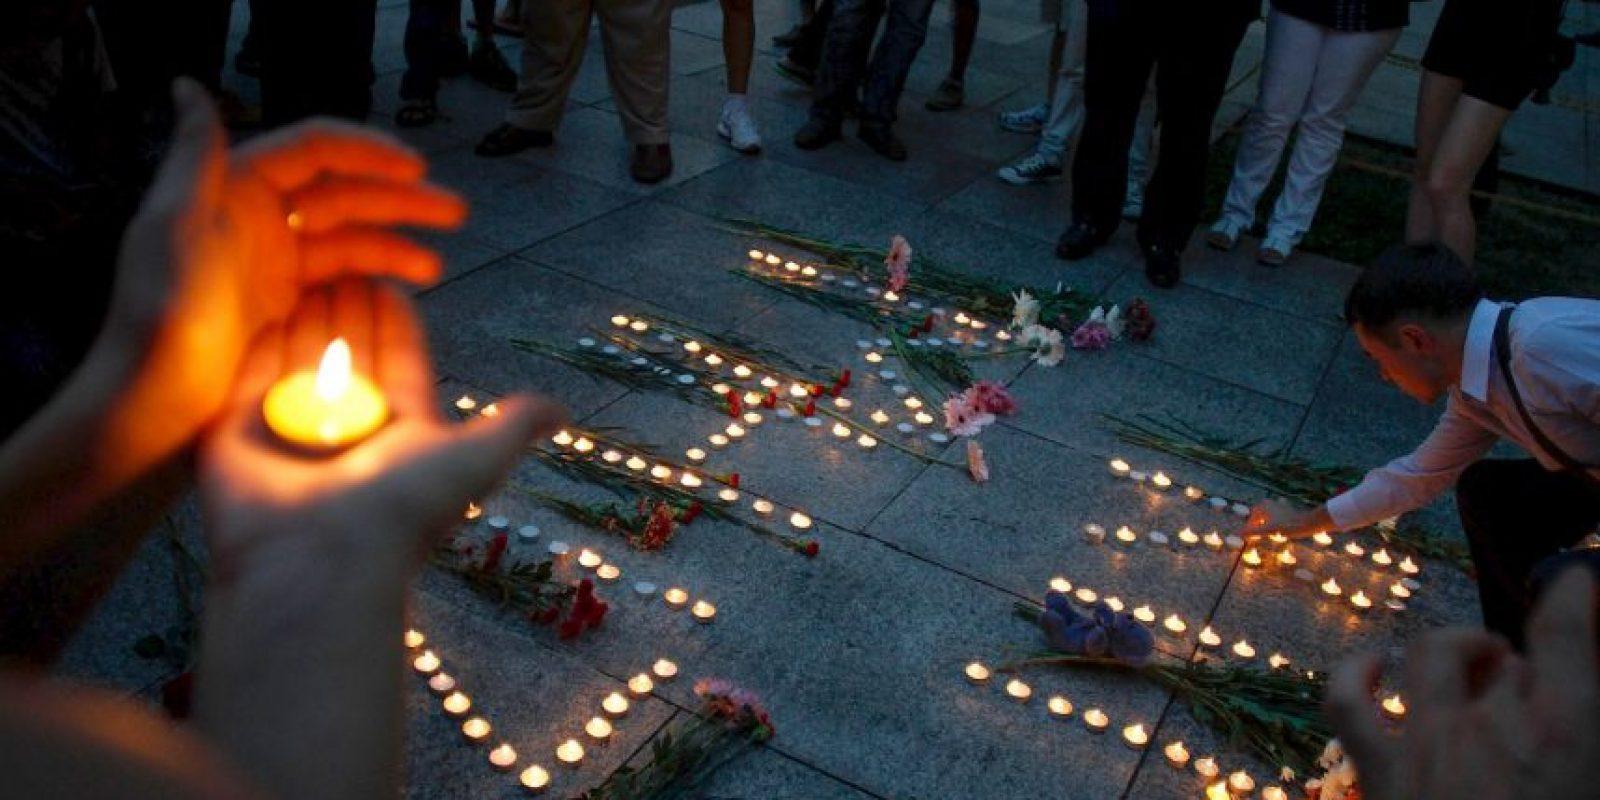 5. 17 de julio: Vuelo MH17 de Malaysia Airlines Foto:Getty Images